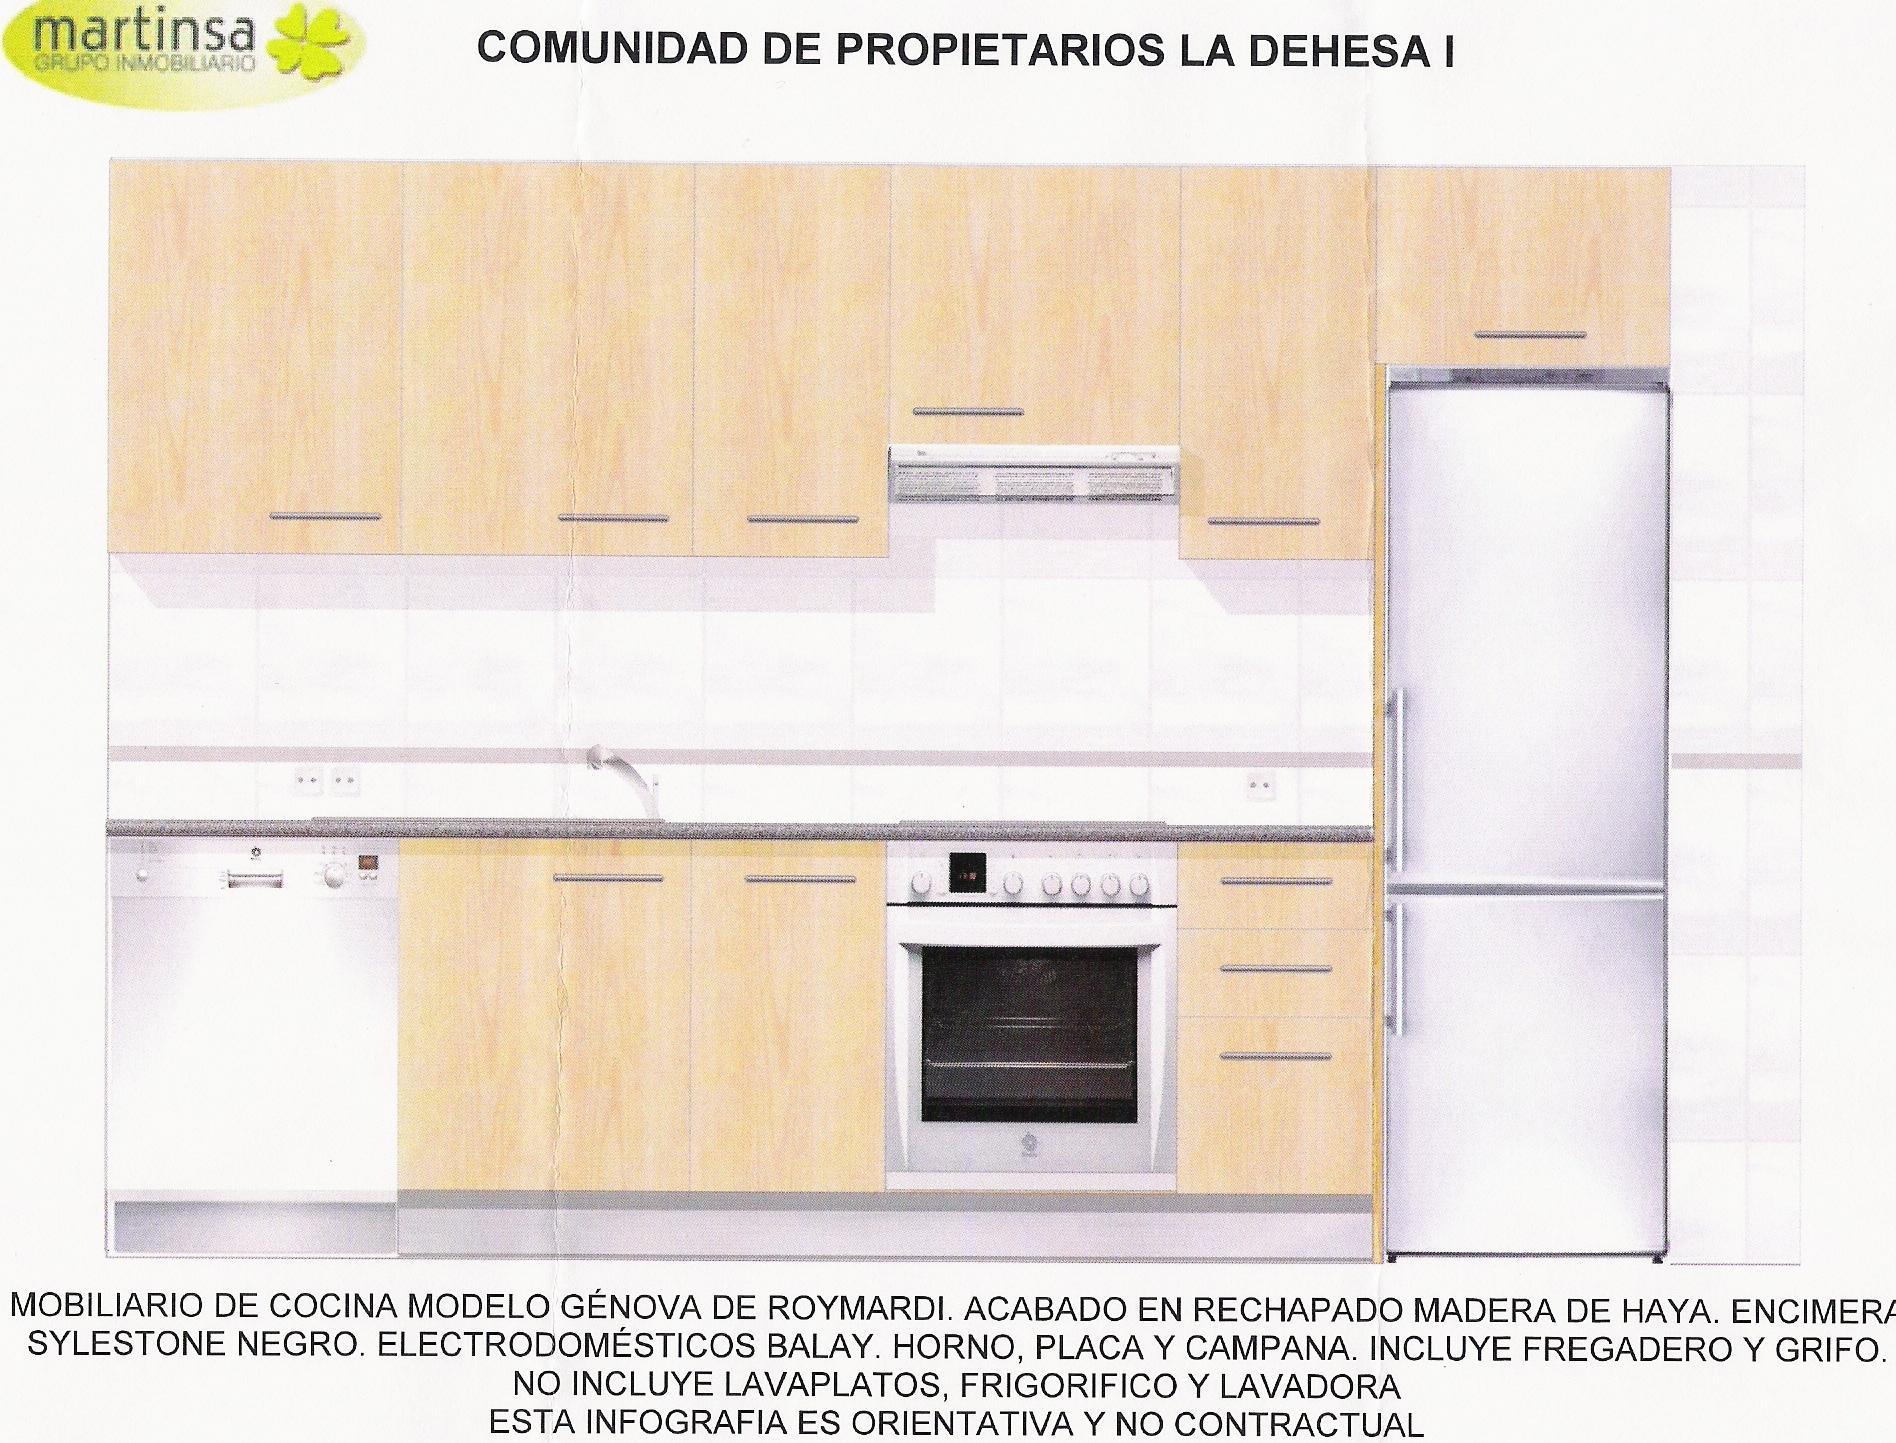 C p la dehesa i documento mobiliario cocina roymardi for Mobiliario cocina barato